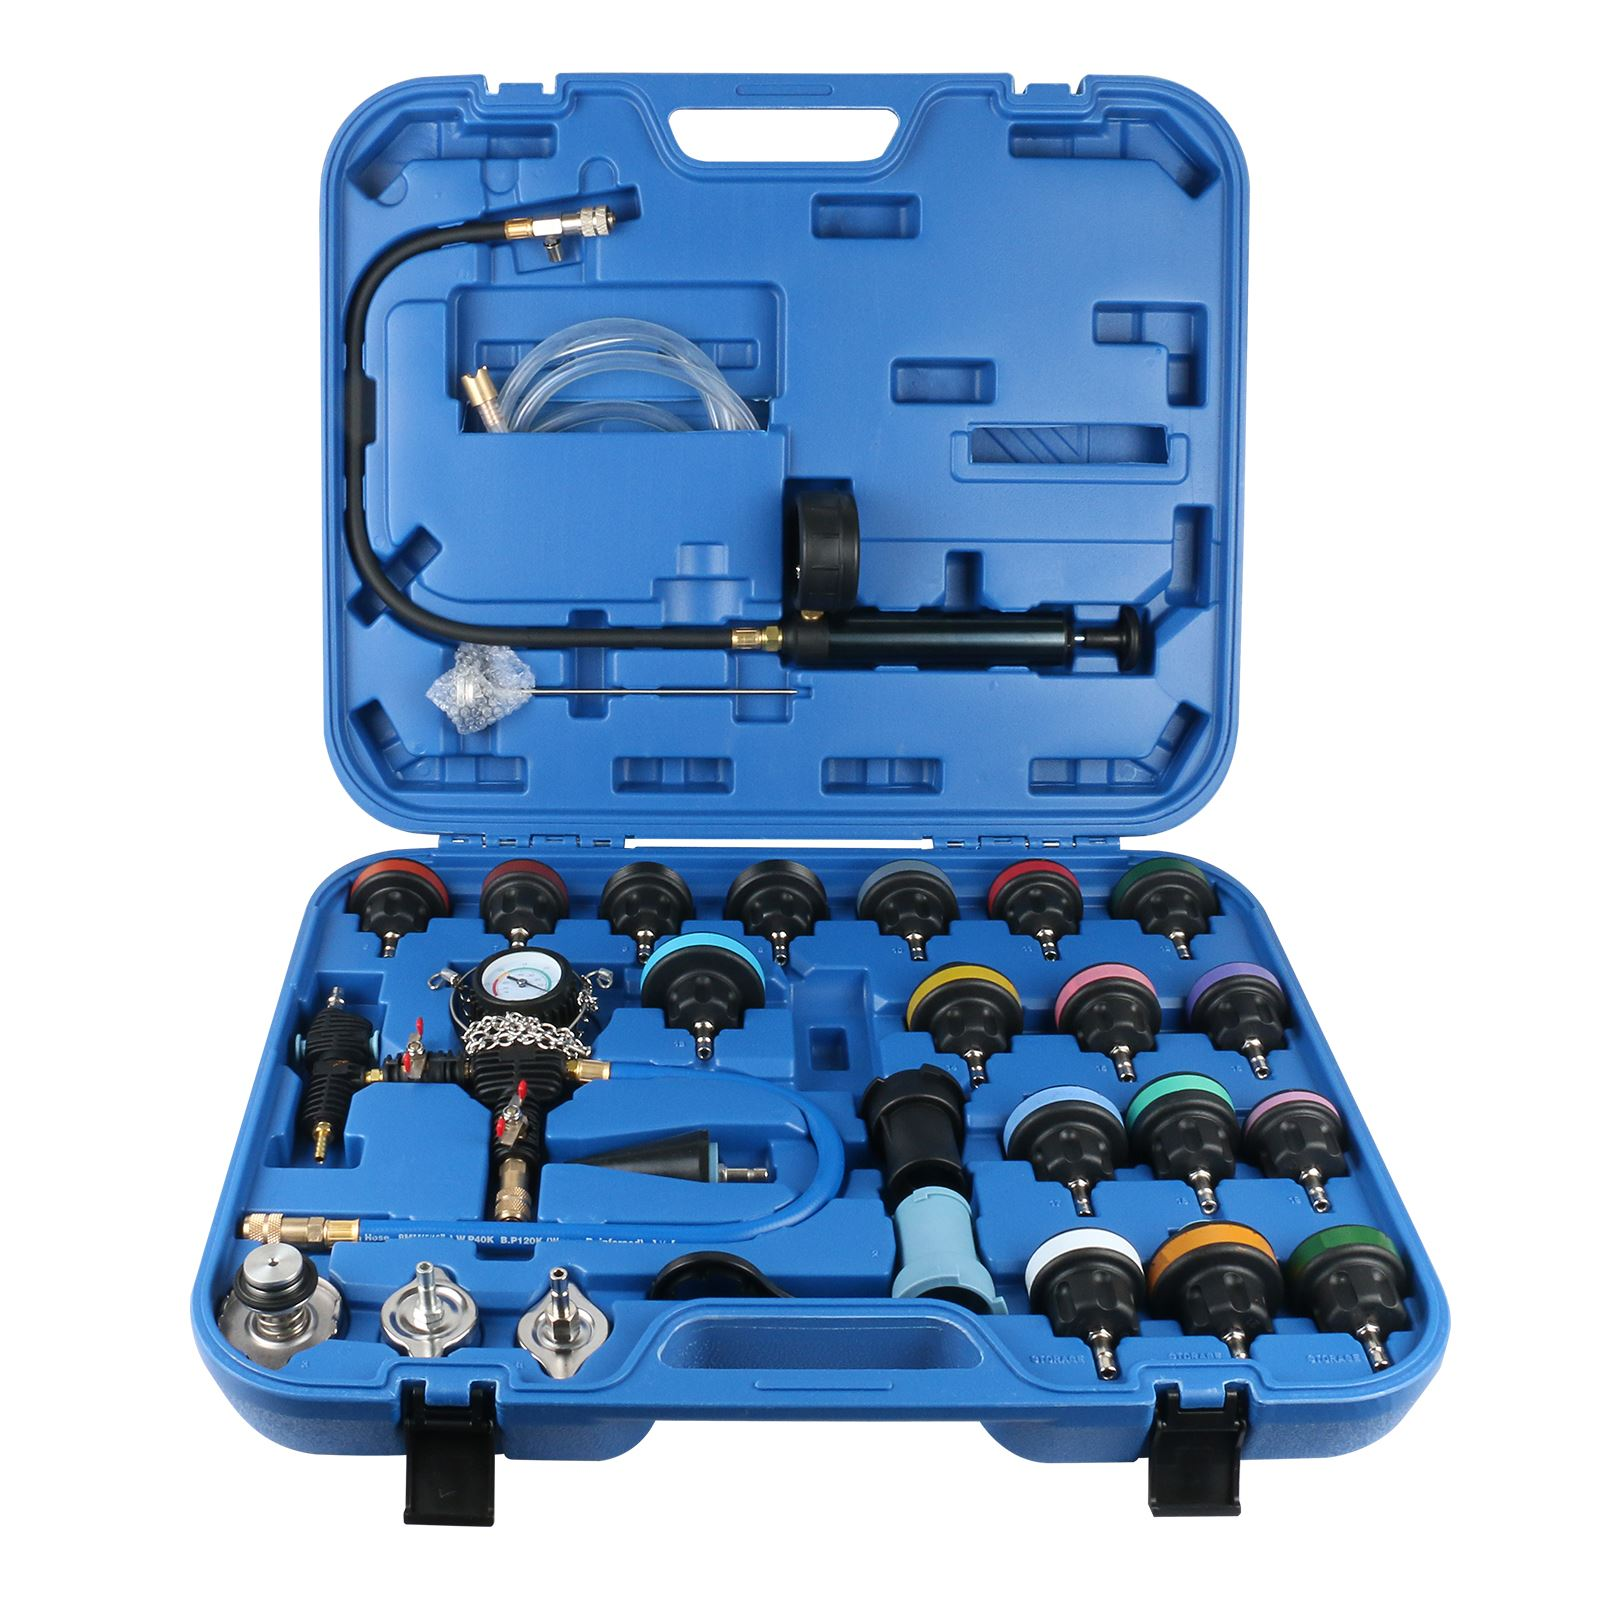 PEUGEOT 505 551D 2.0 Handbrake Cable Rear 82 to 89 Hand Brake Parking QH 483477